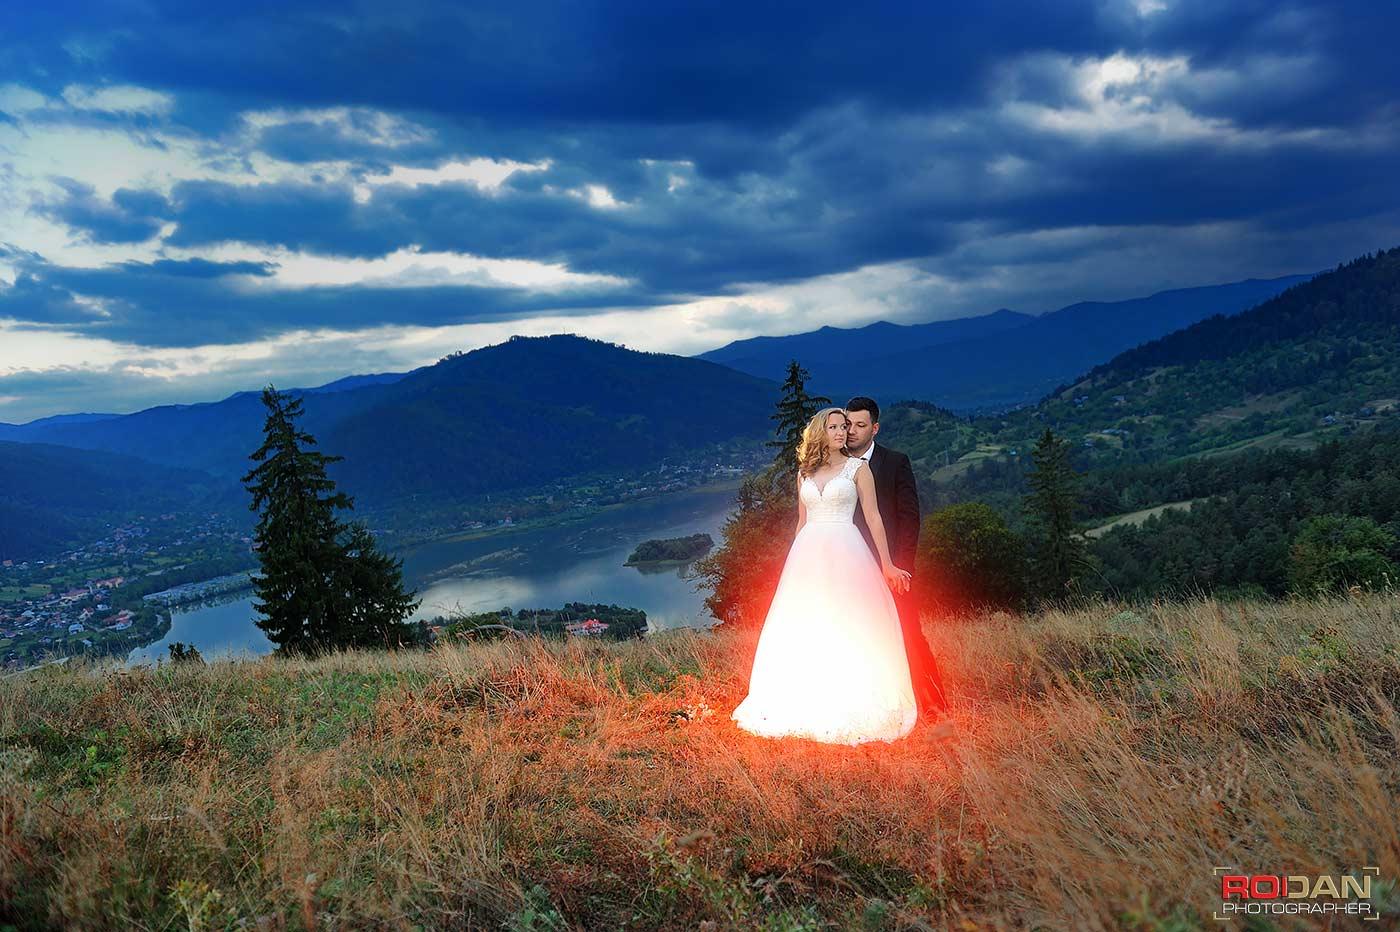 Fotograf de nunta Piatra Neamt - Rodan Photography